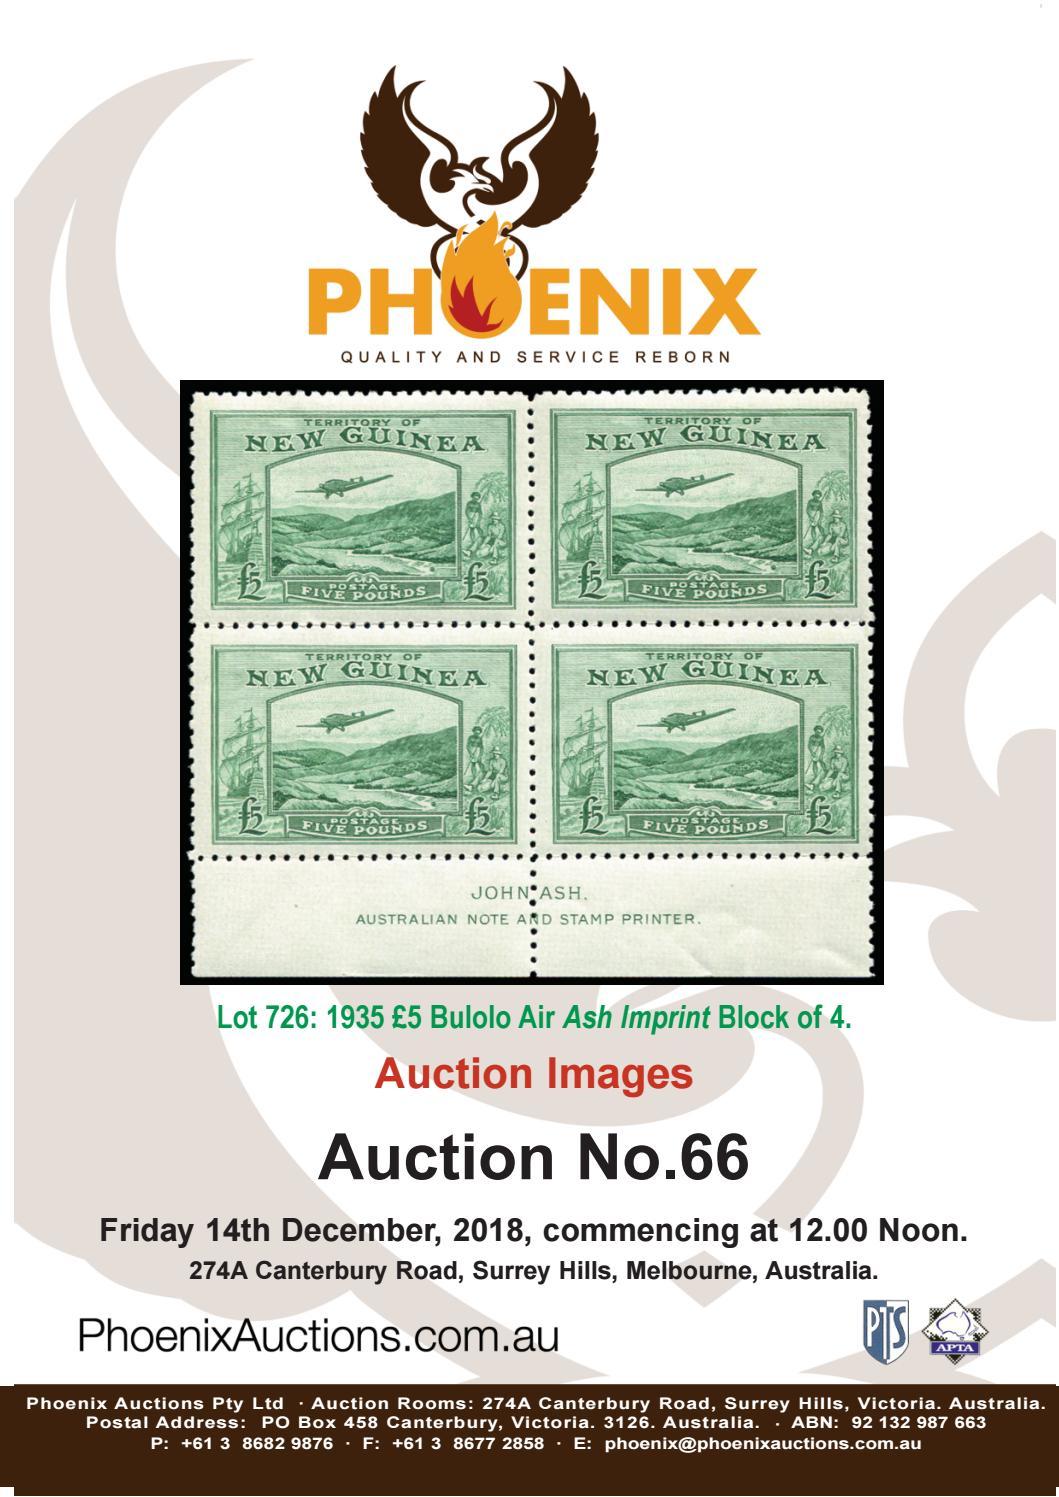 Phoenix Auctions 66 by Phoenix Auctions Pty Ltd - issuu